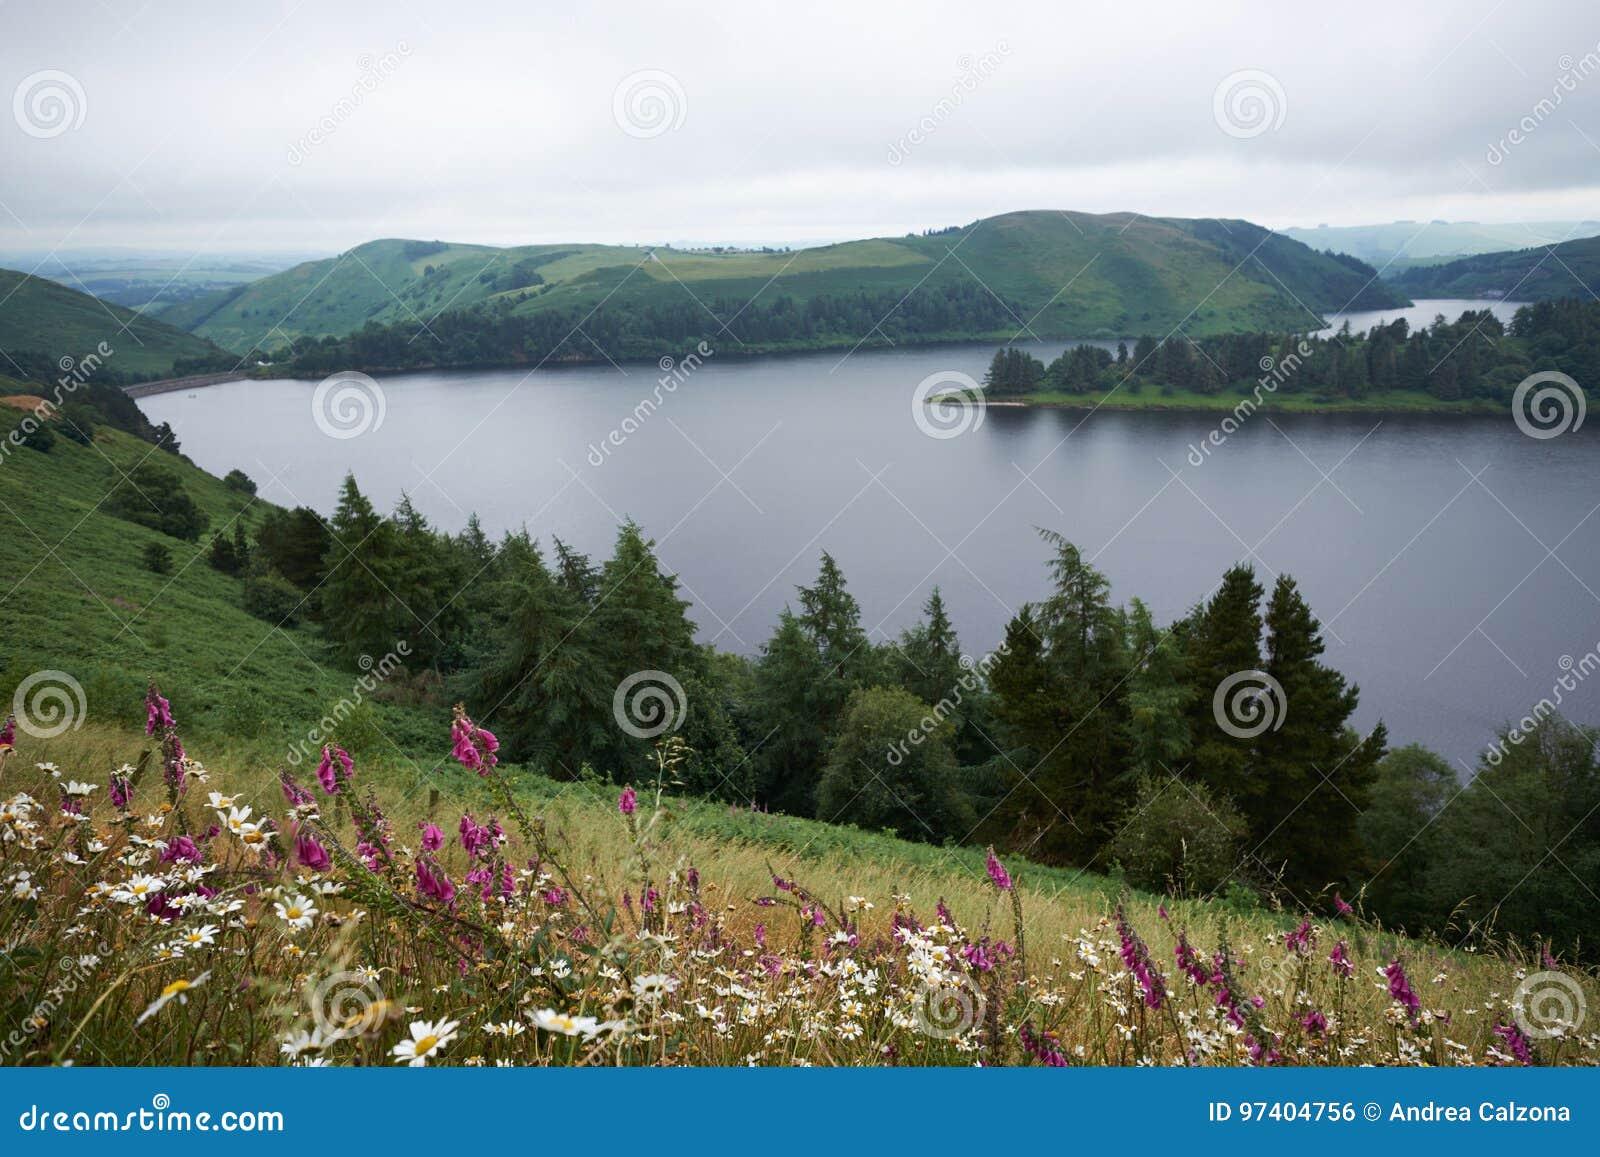 Llyn Clywedog Reservoir cerca de Llanidloes Powys País de Gales